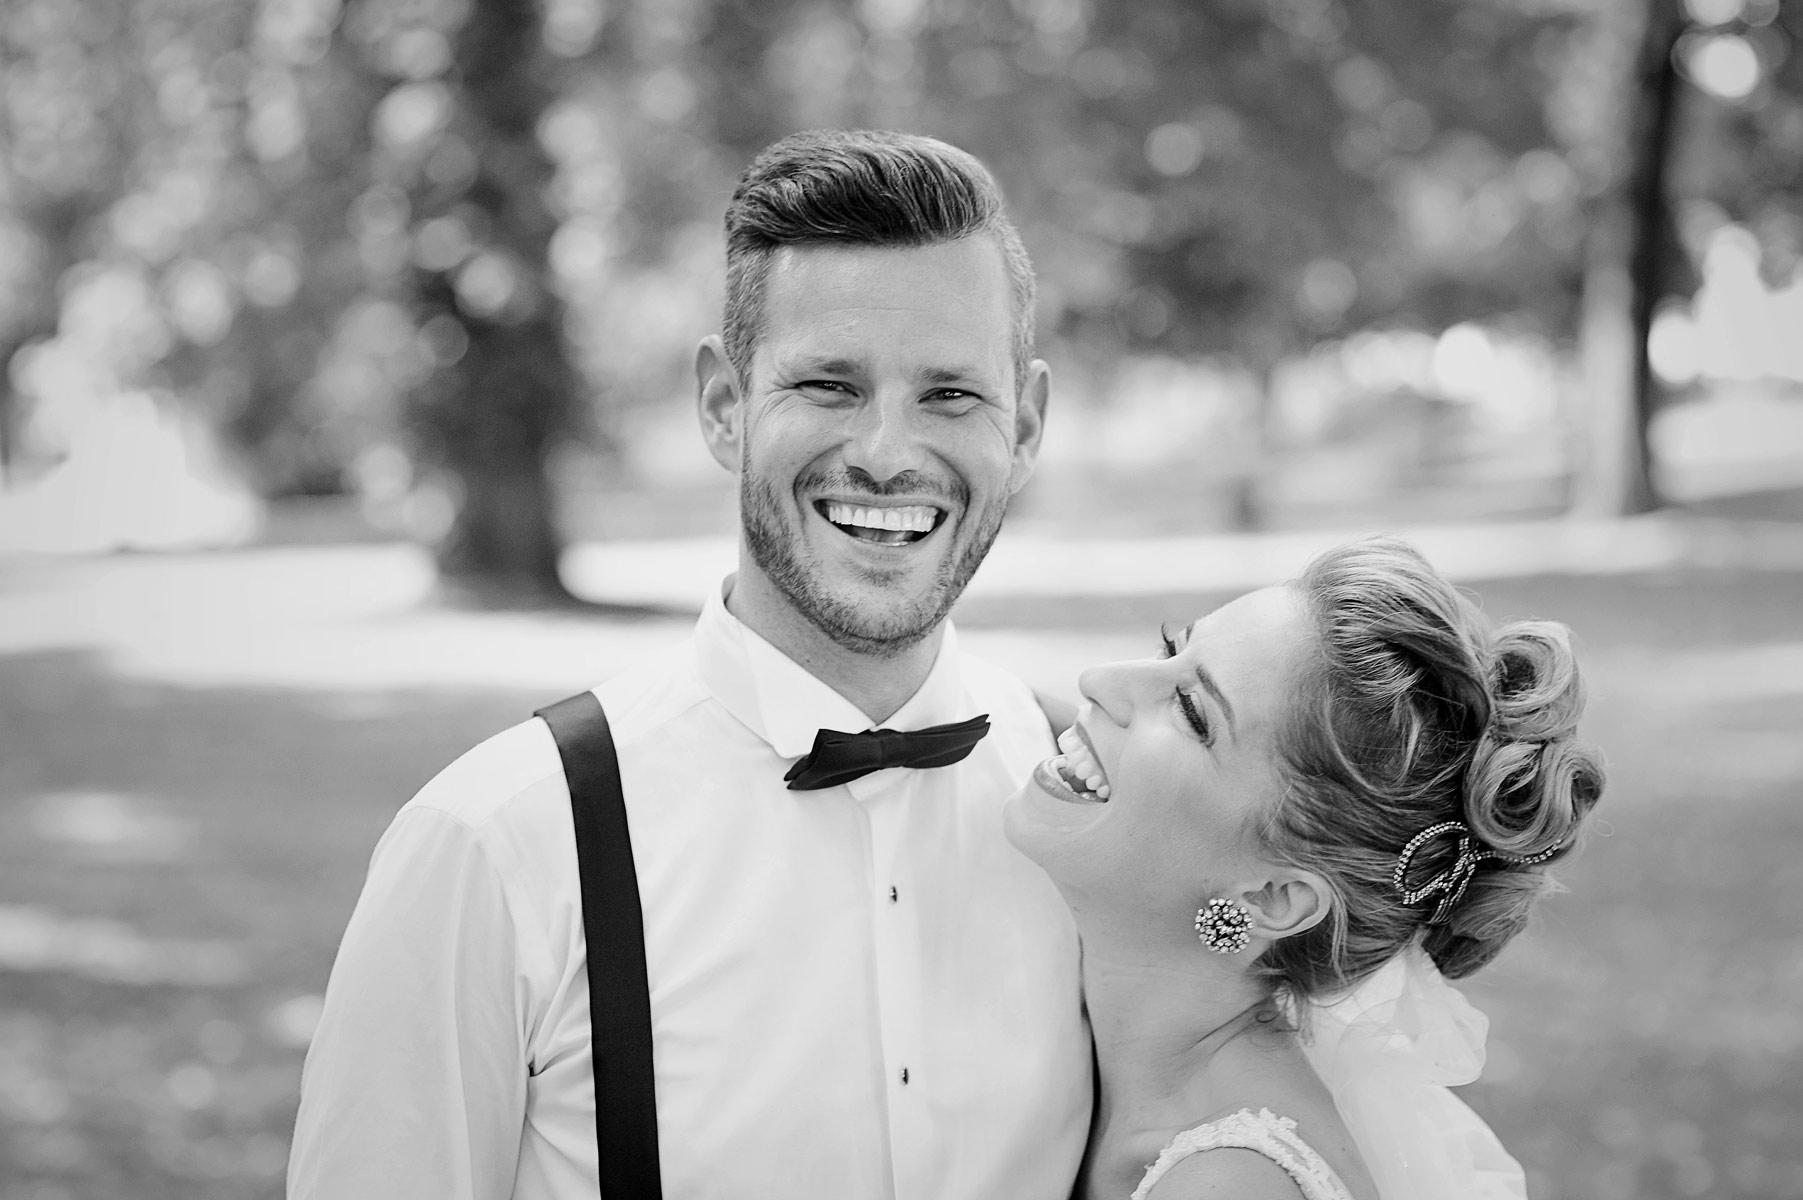 Hochzeitsfotos_Bad_Ems_Nicole_Bouillon_Fotografie7